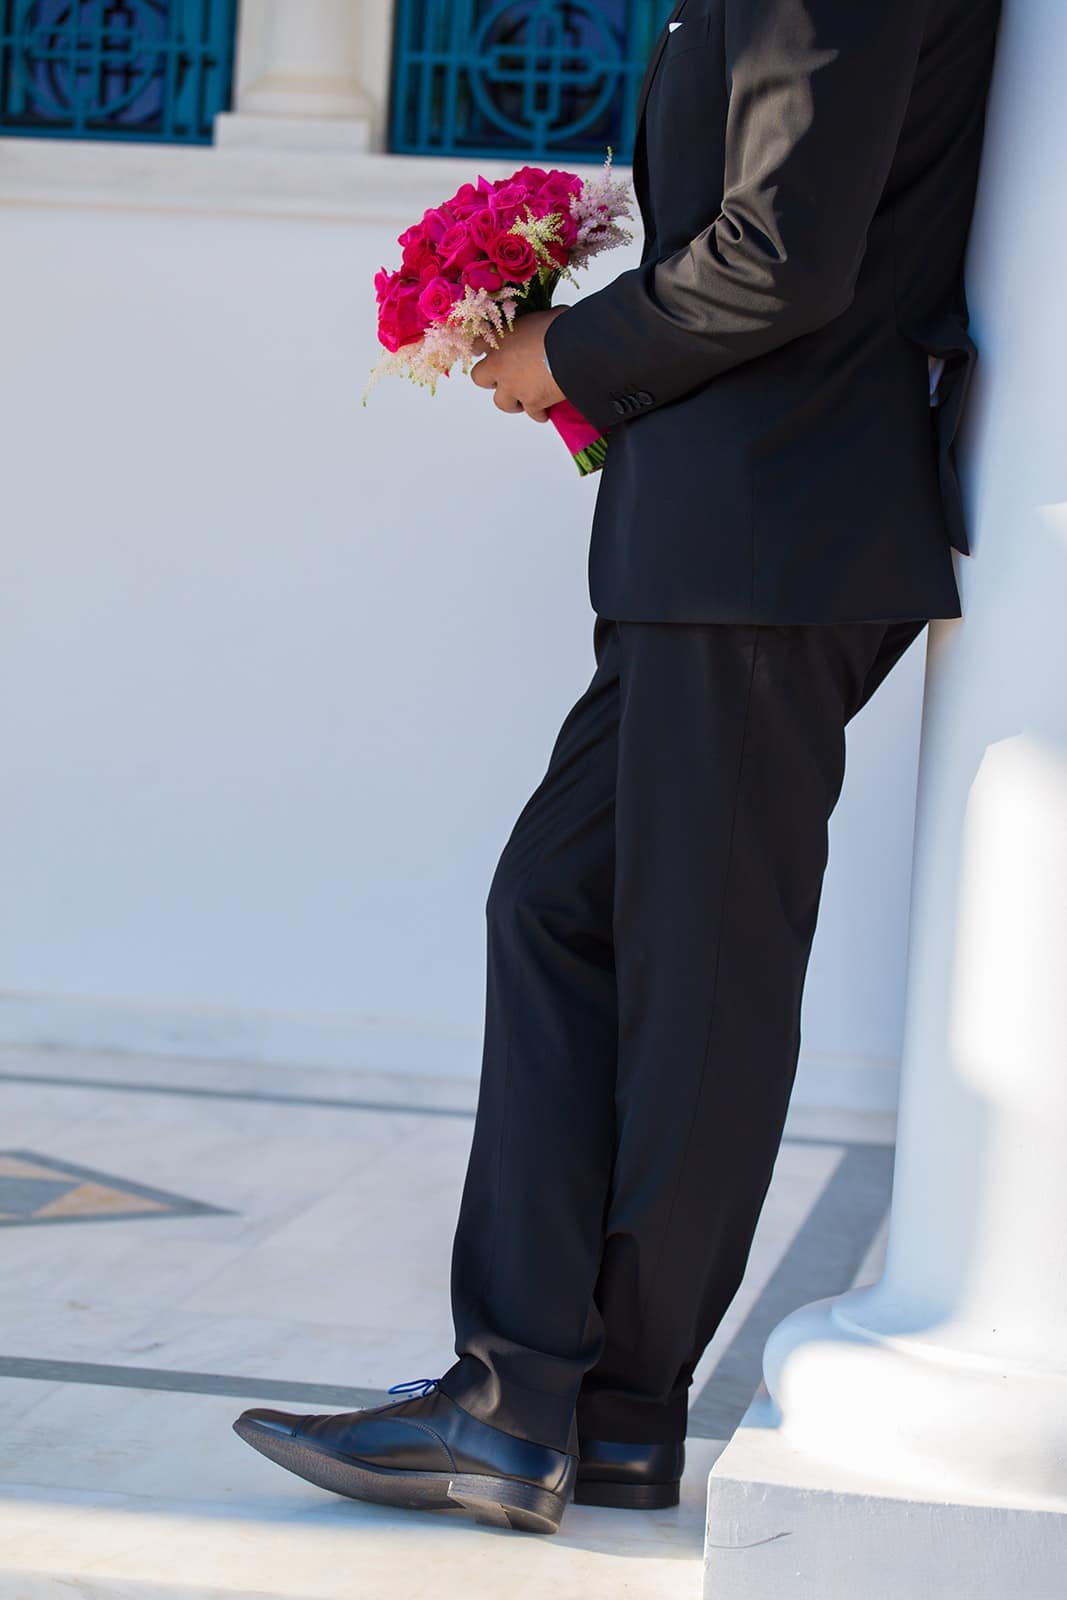 Fuschia detailed wedding